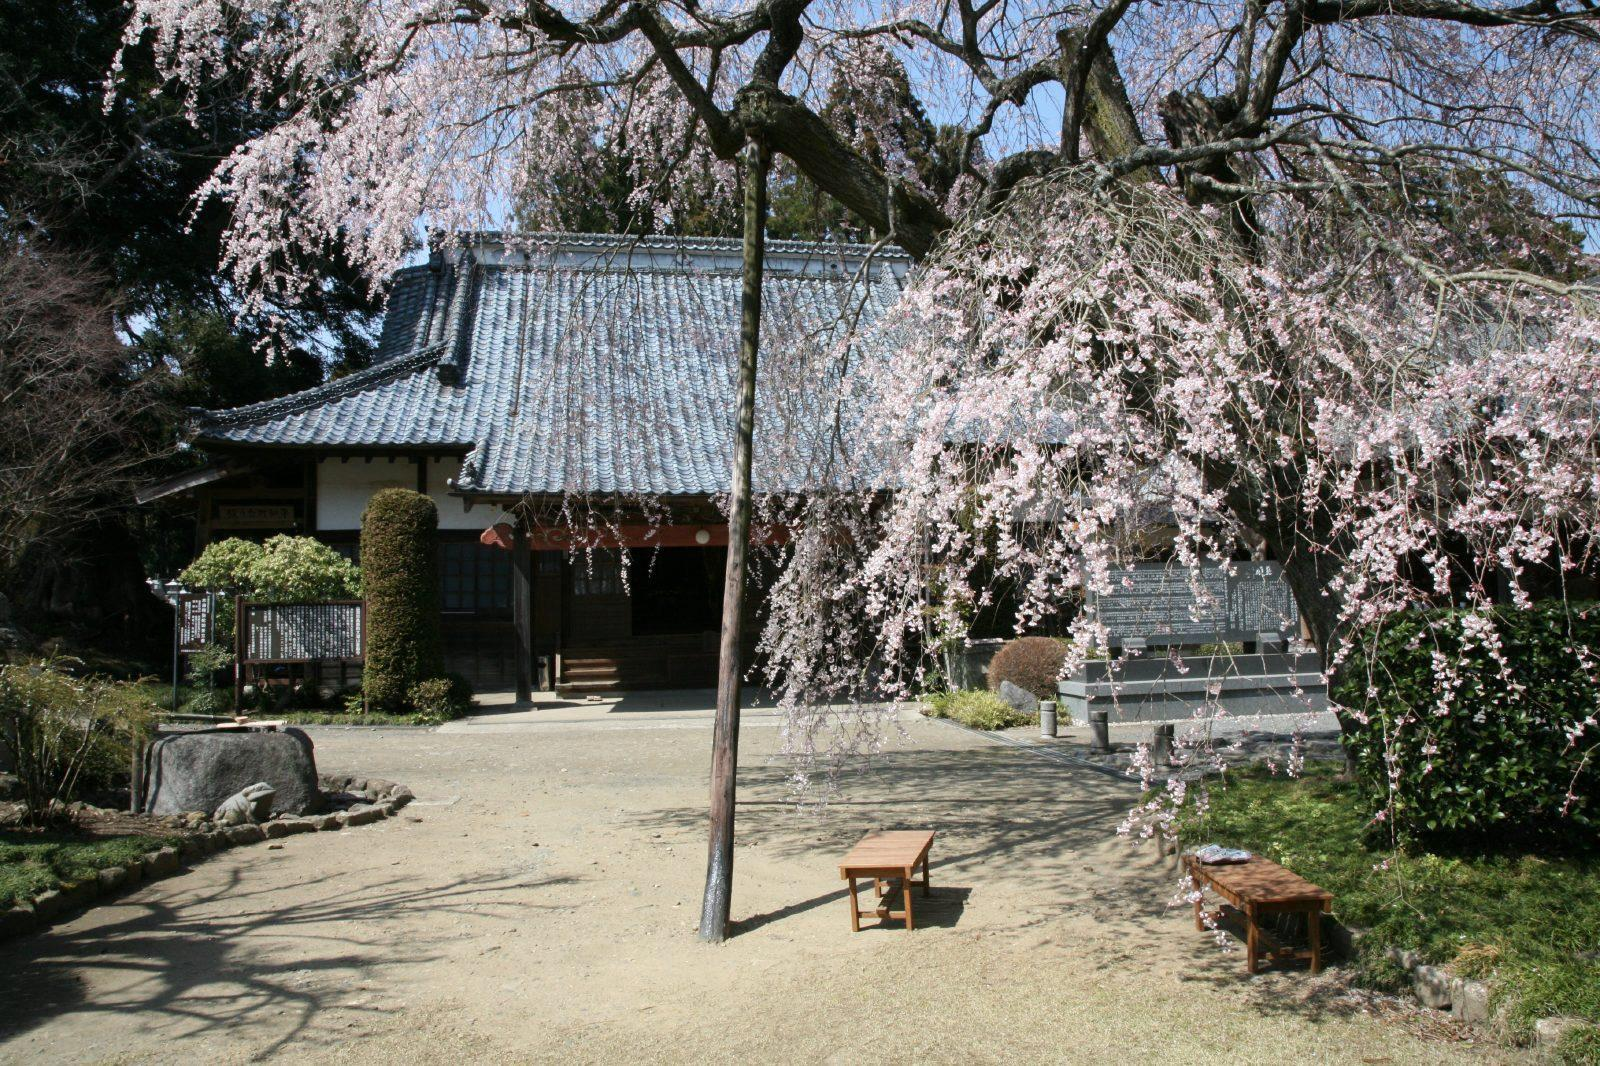 Soryu-ji temple and the weeping cherry tree